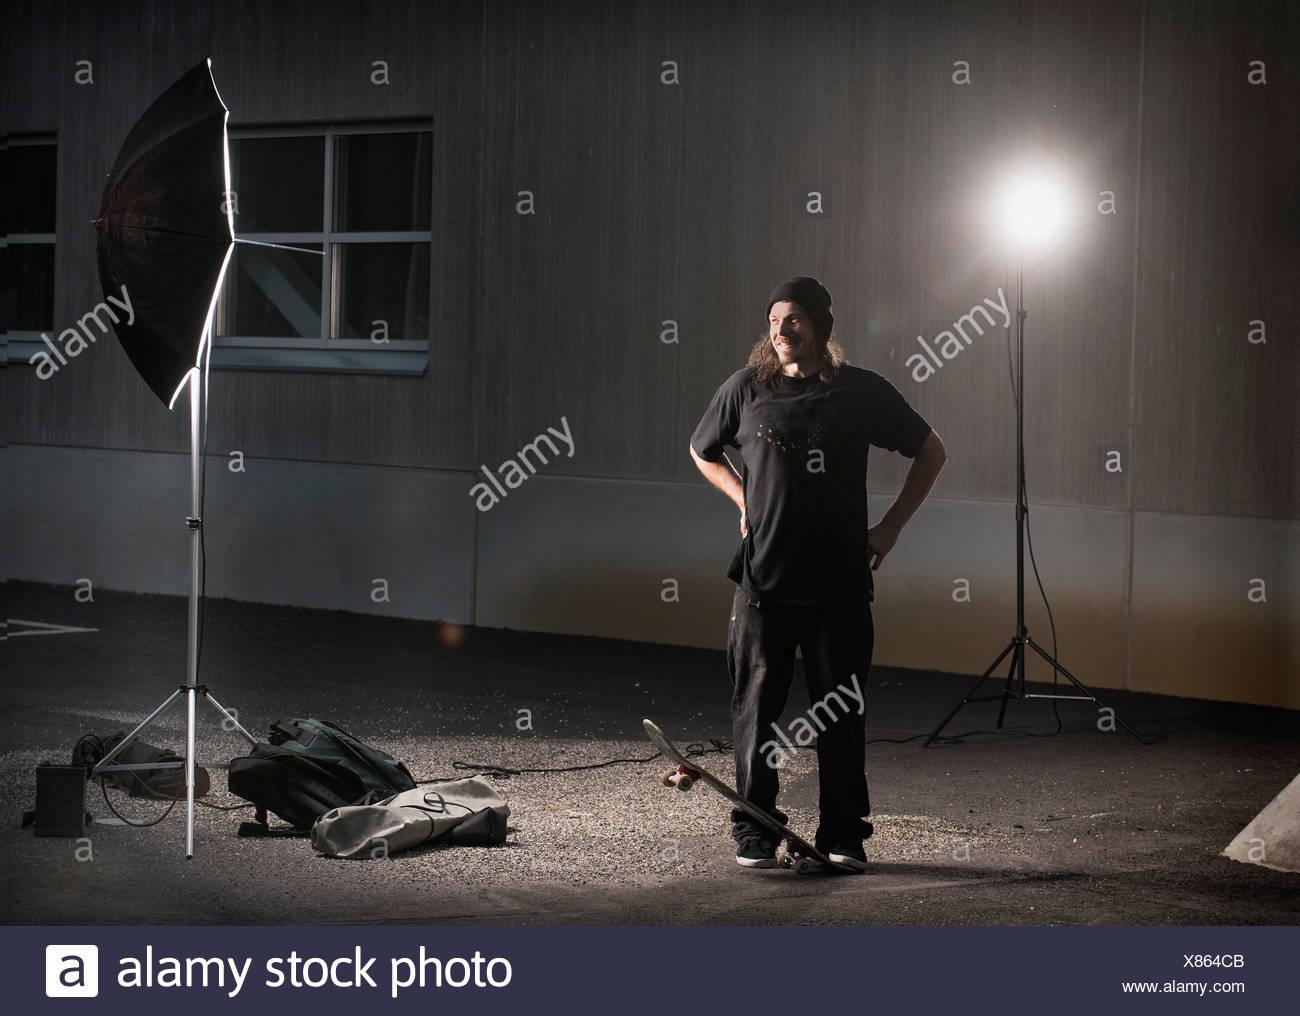 Skater standing under photo lights - Stock Image